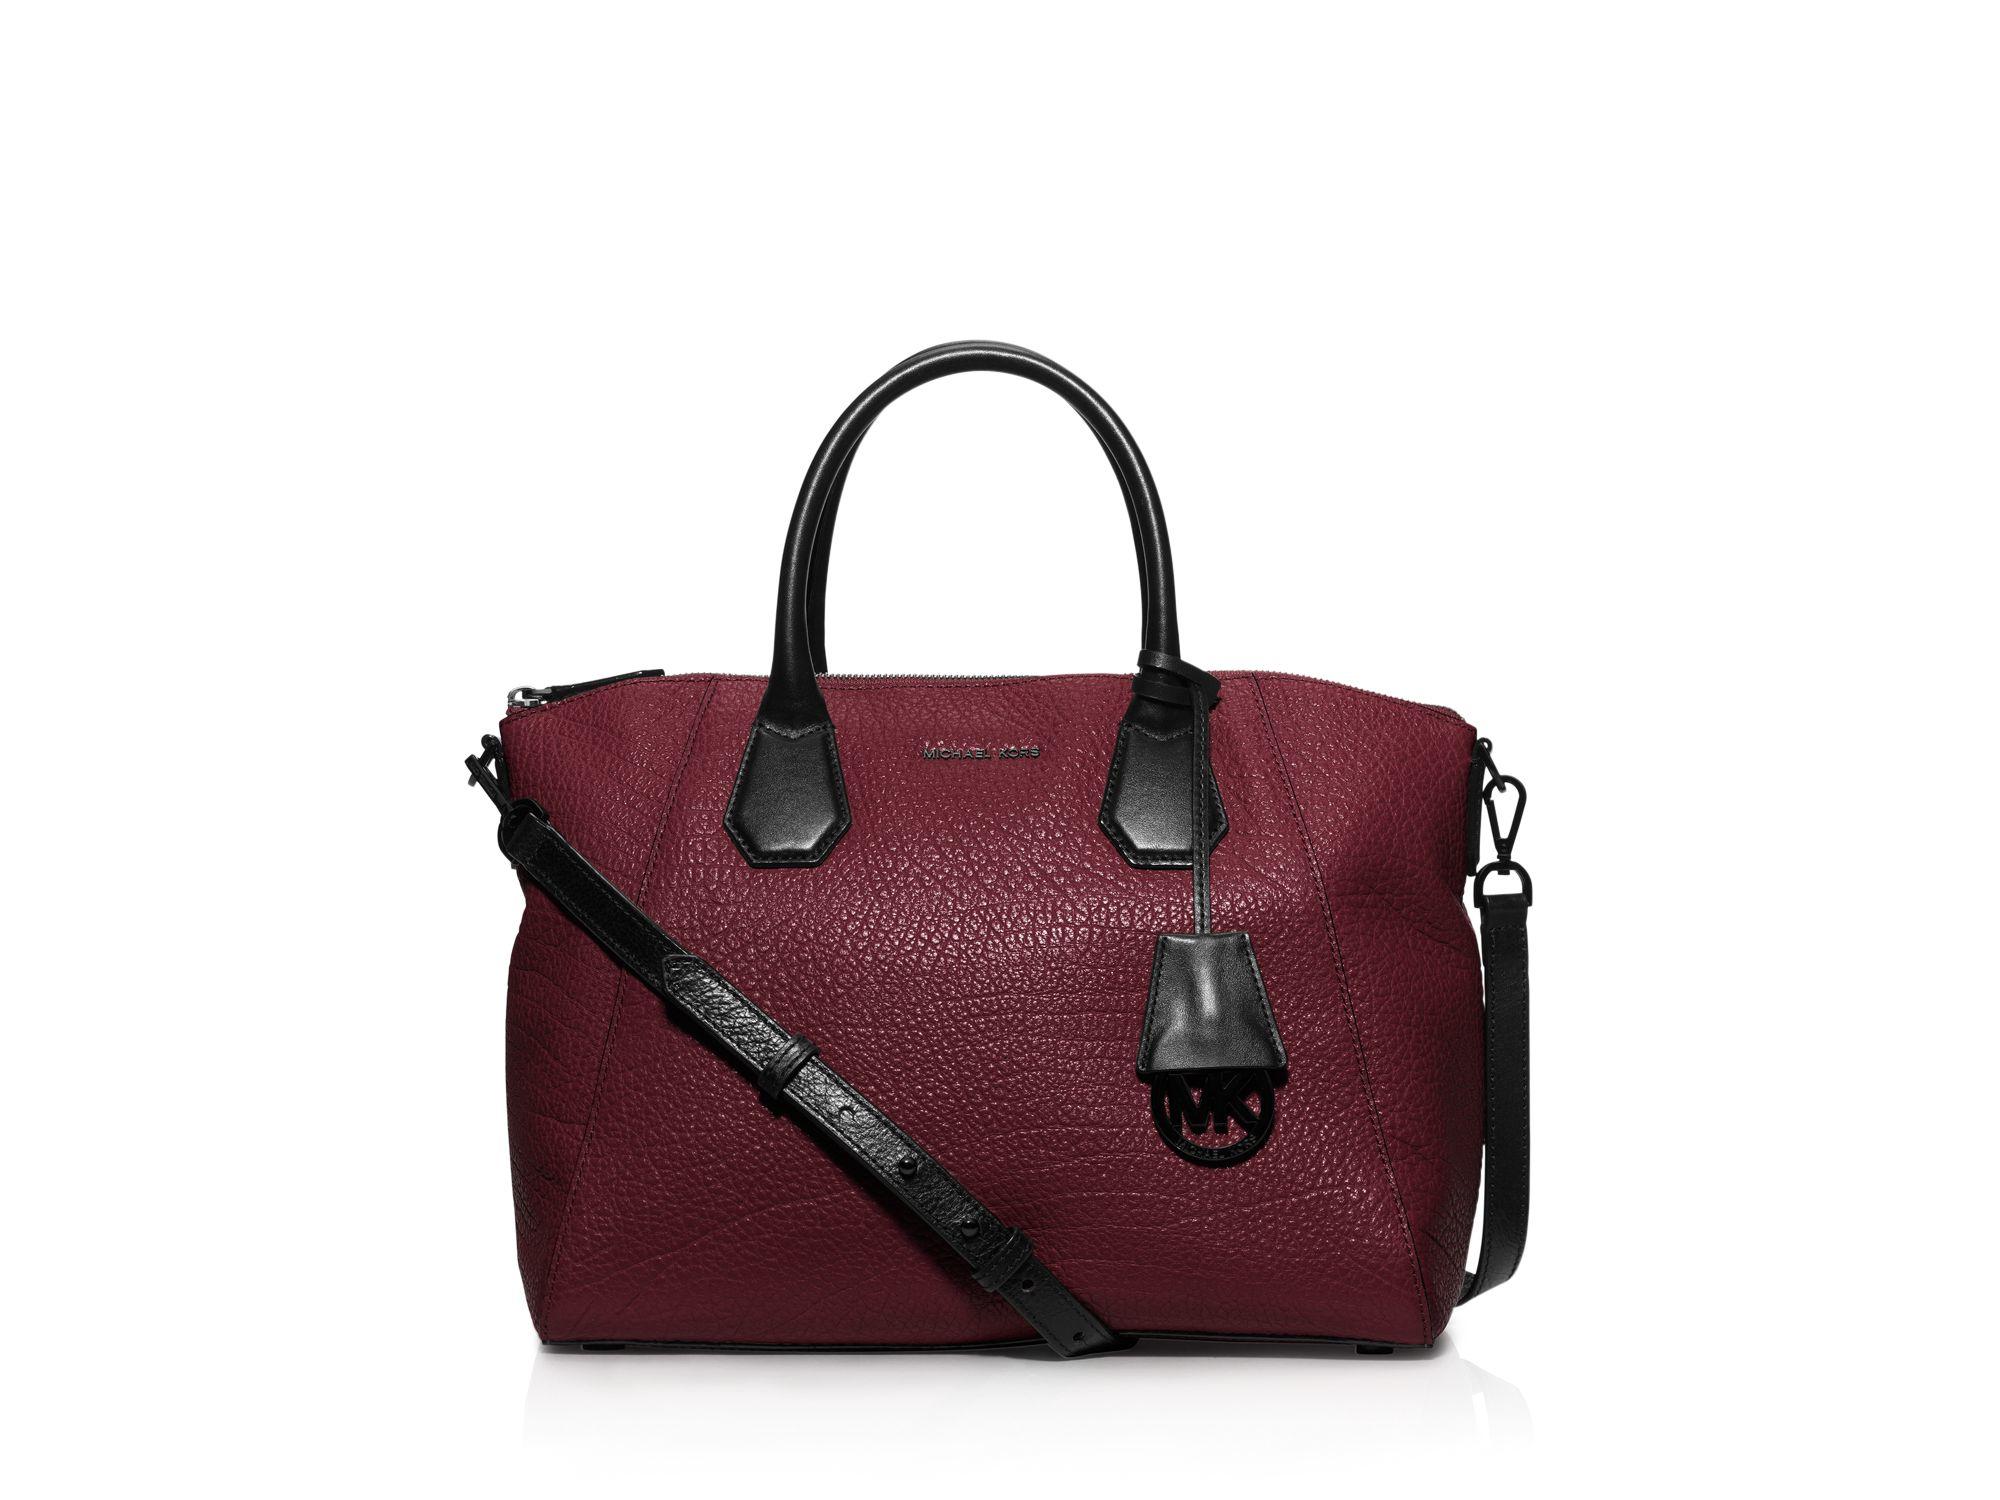 1acd77041278 michael kors at bloomingdale s handbags kohls - Marwood ...